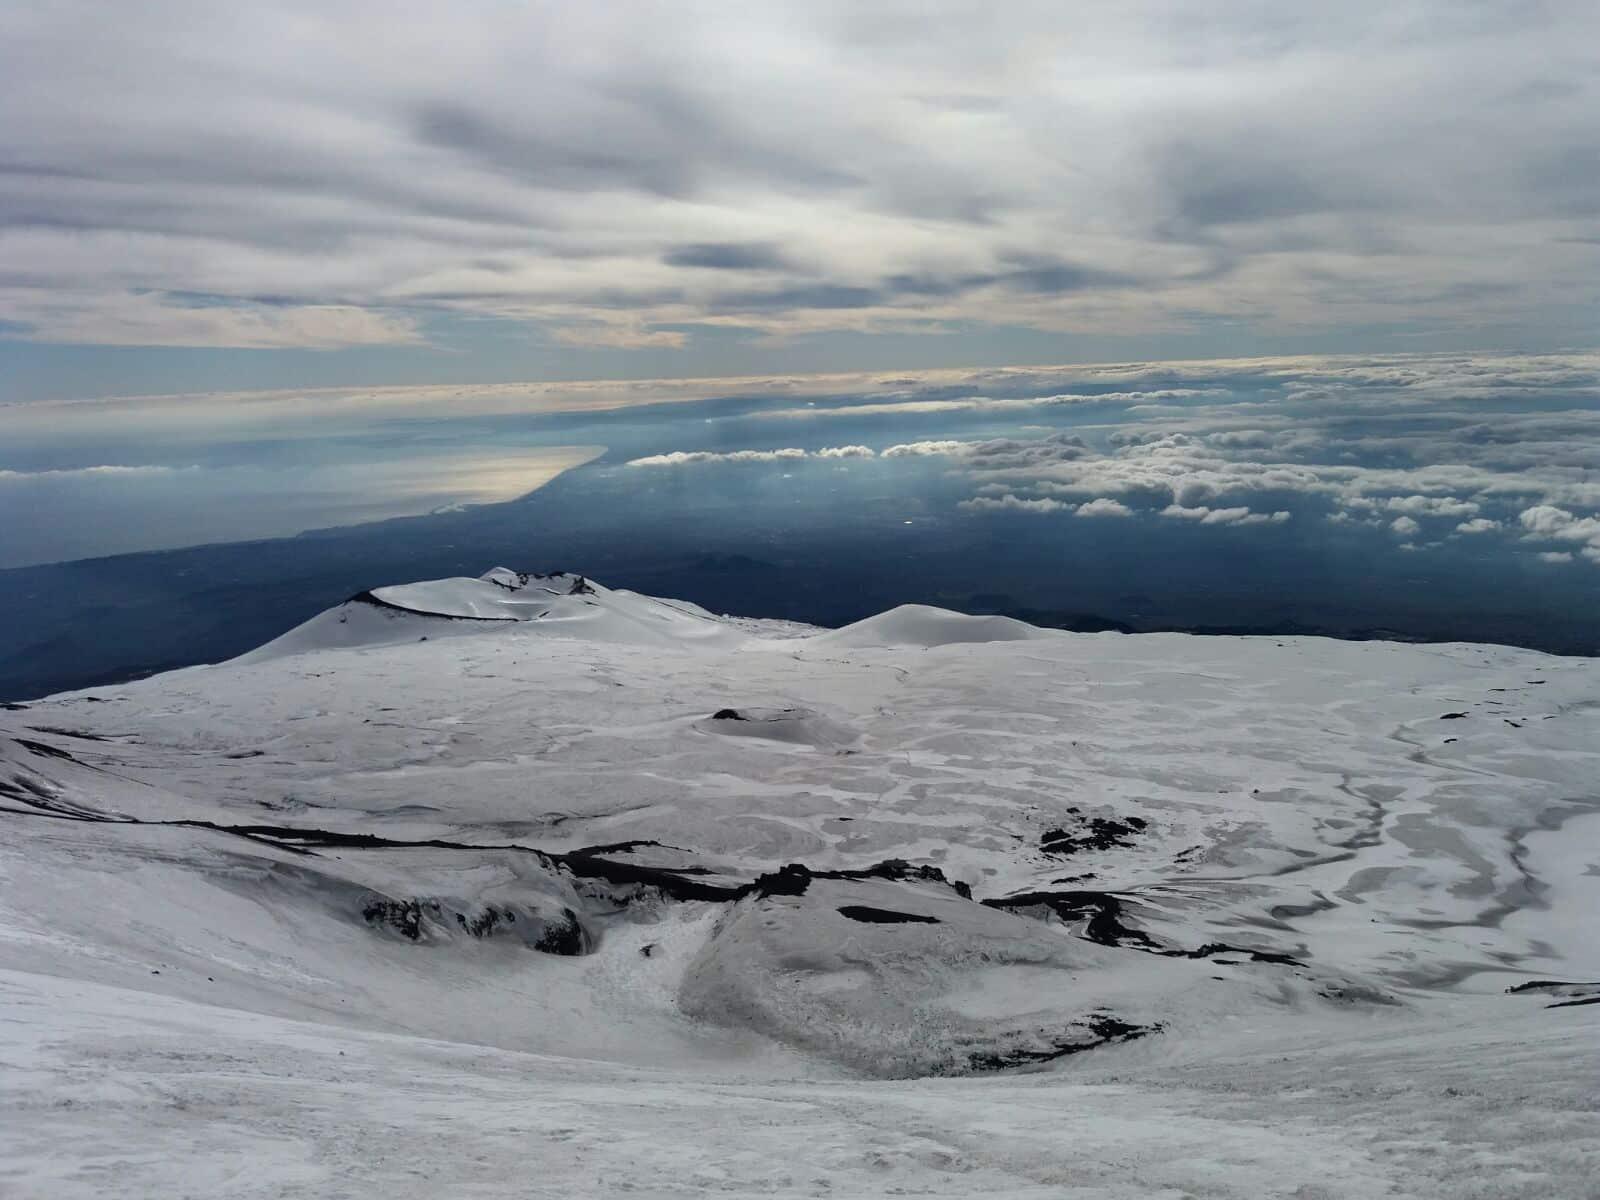 Guided ski touring on Mount Etna